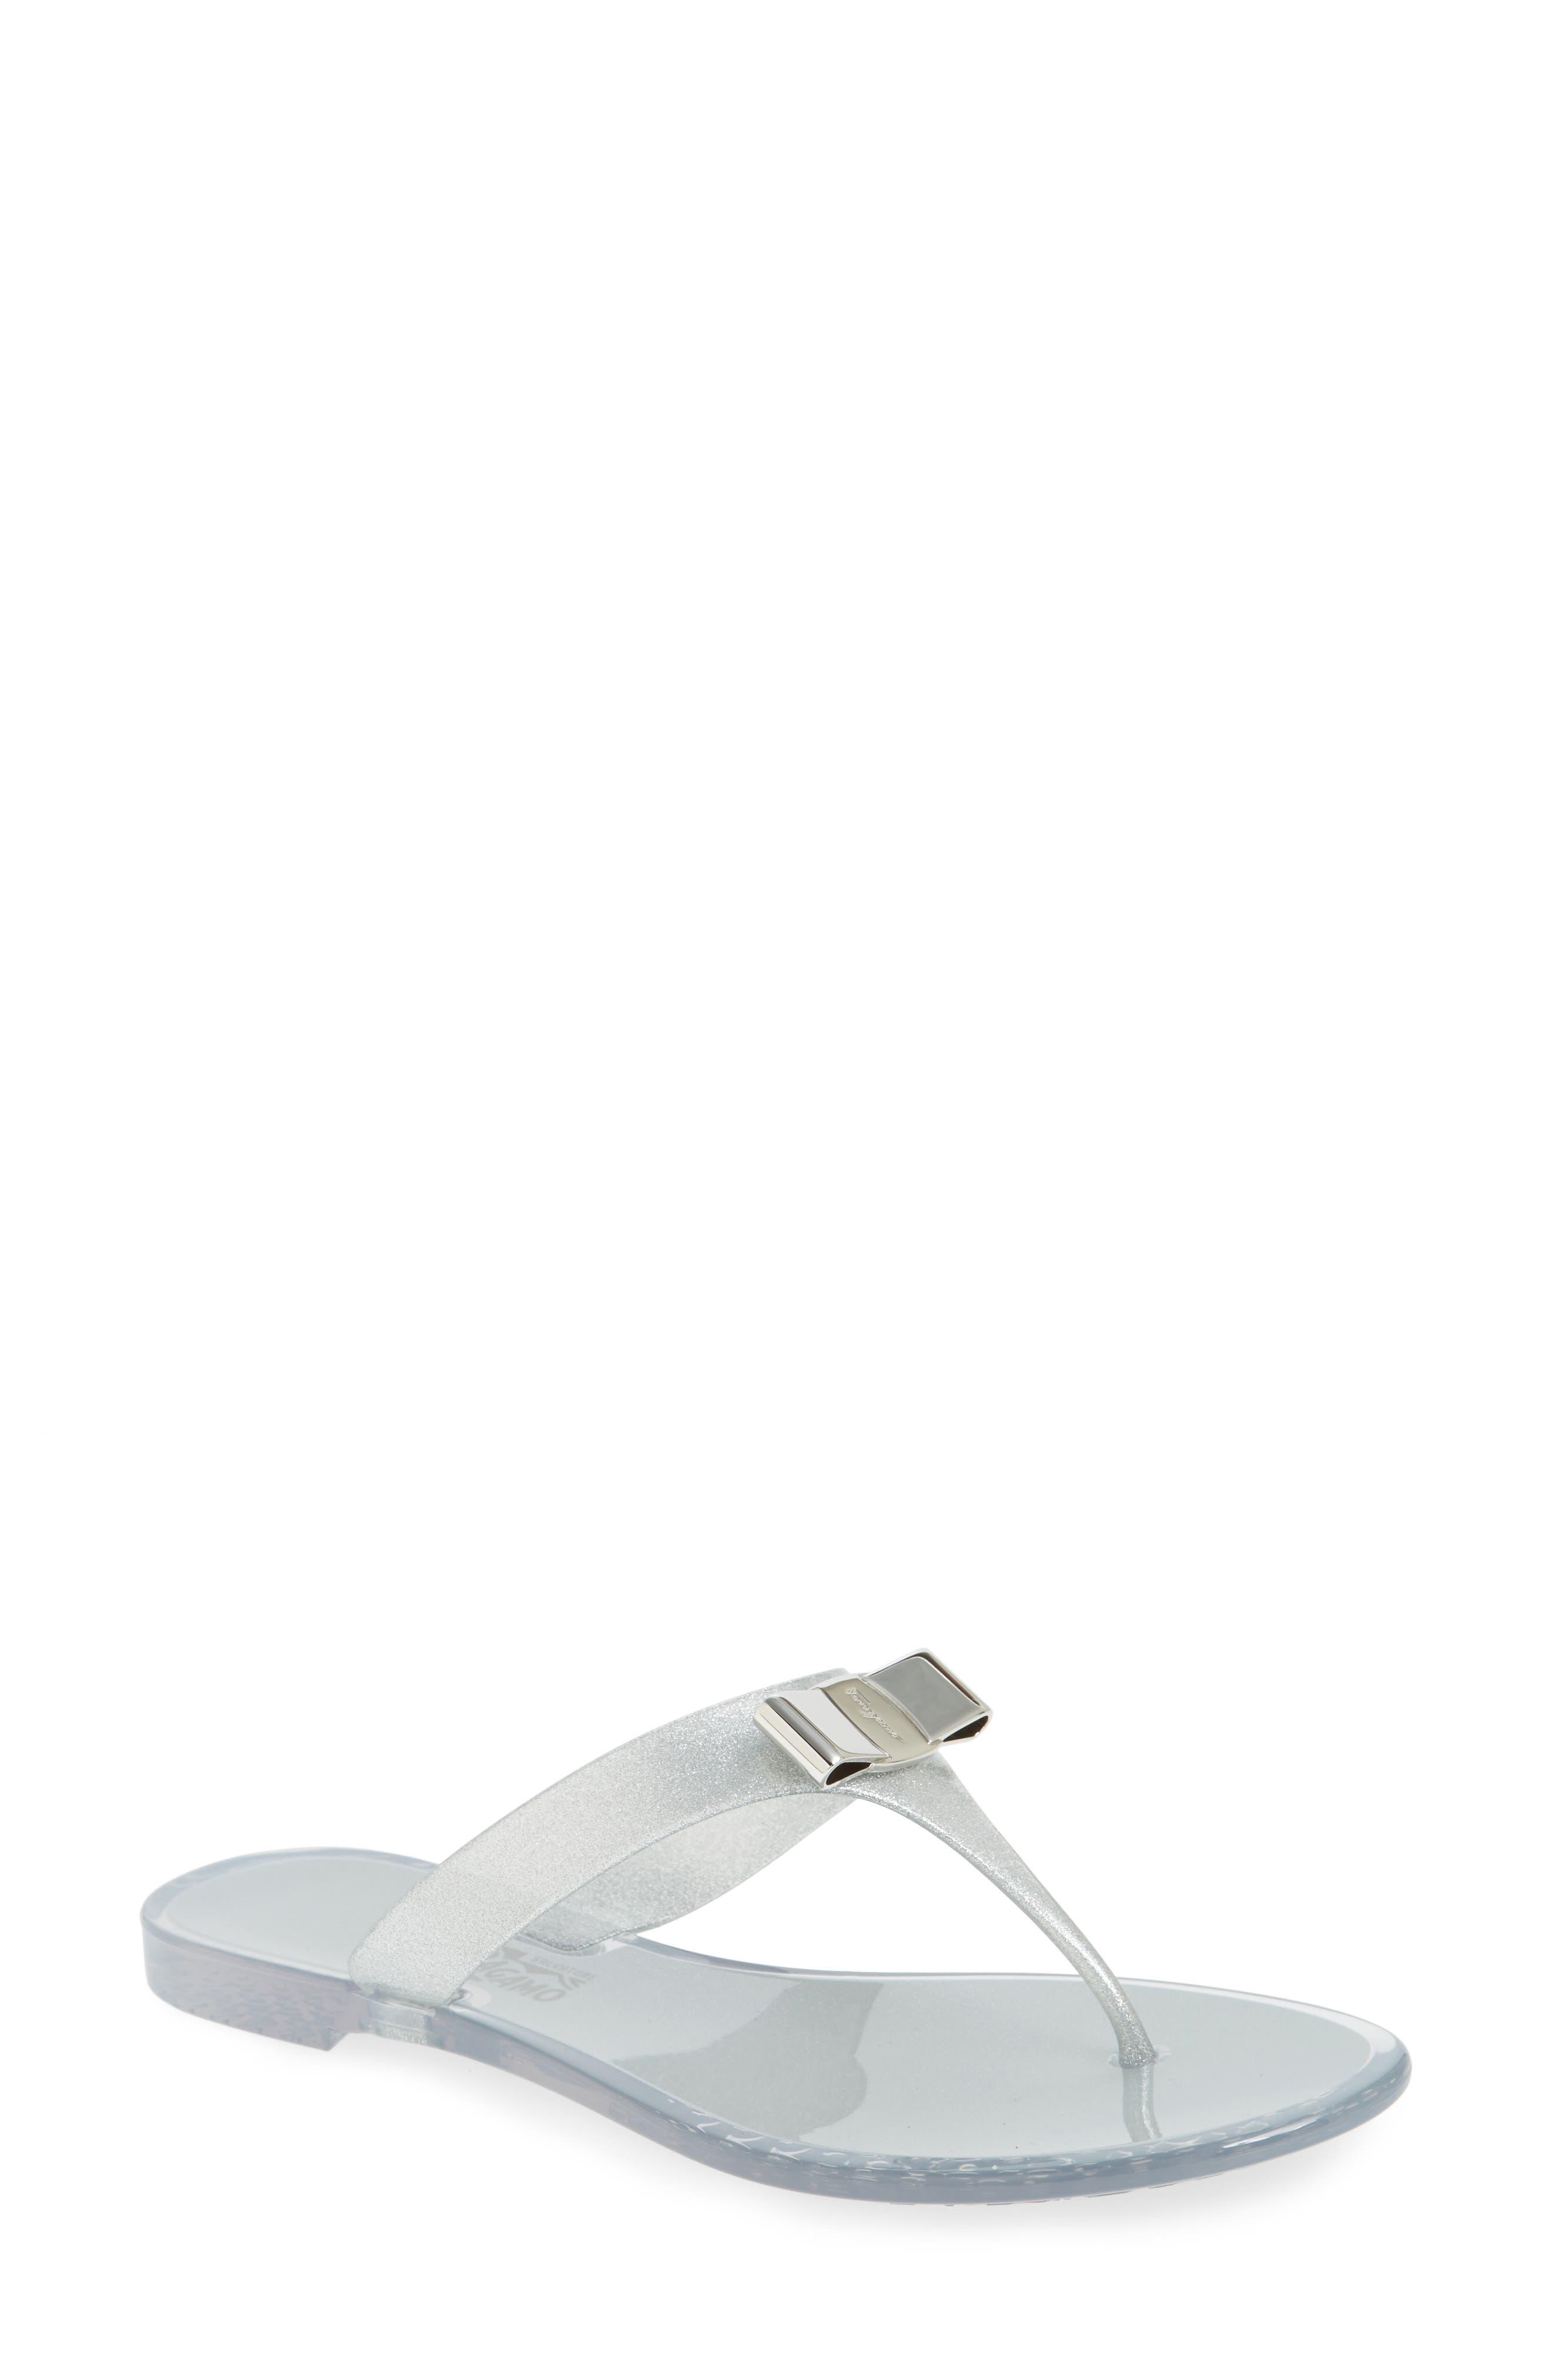 Farelia Jelly Flat Bow Flip Flop,                             Main thumbnail 1, color,                             SILVER GLITTER PVC